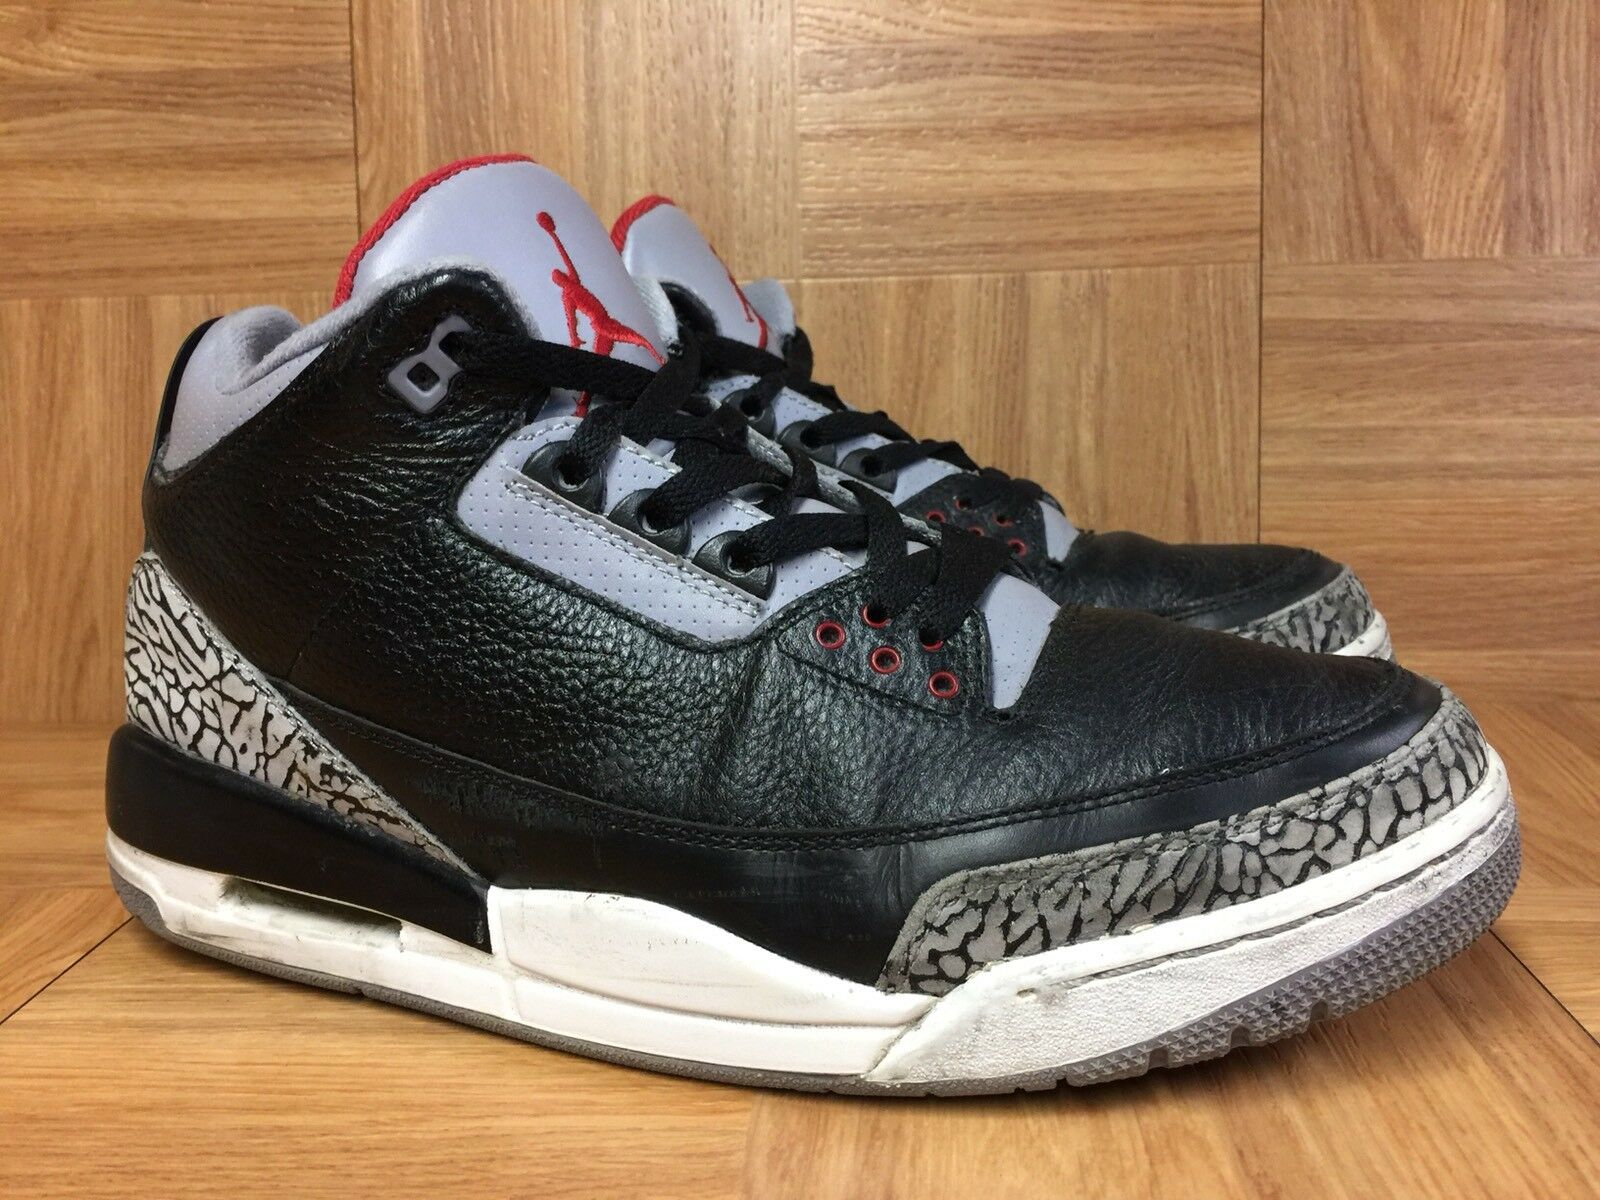 RARENike Air Jordan 3 III Retro Black Varsity 136064-010 Red Cement Gray 10.5 136064-010 Varsity 4f3820